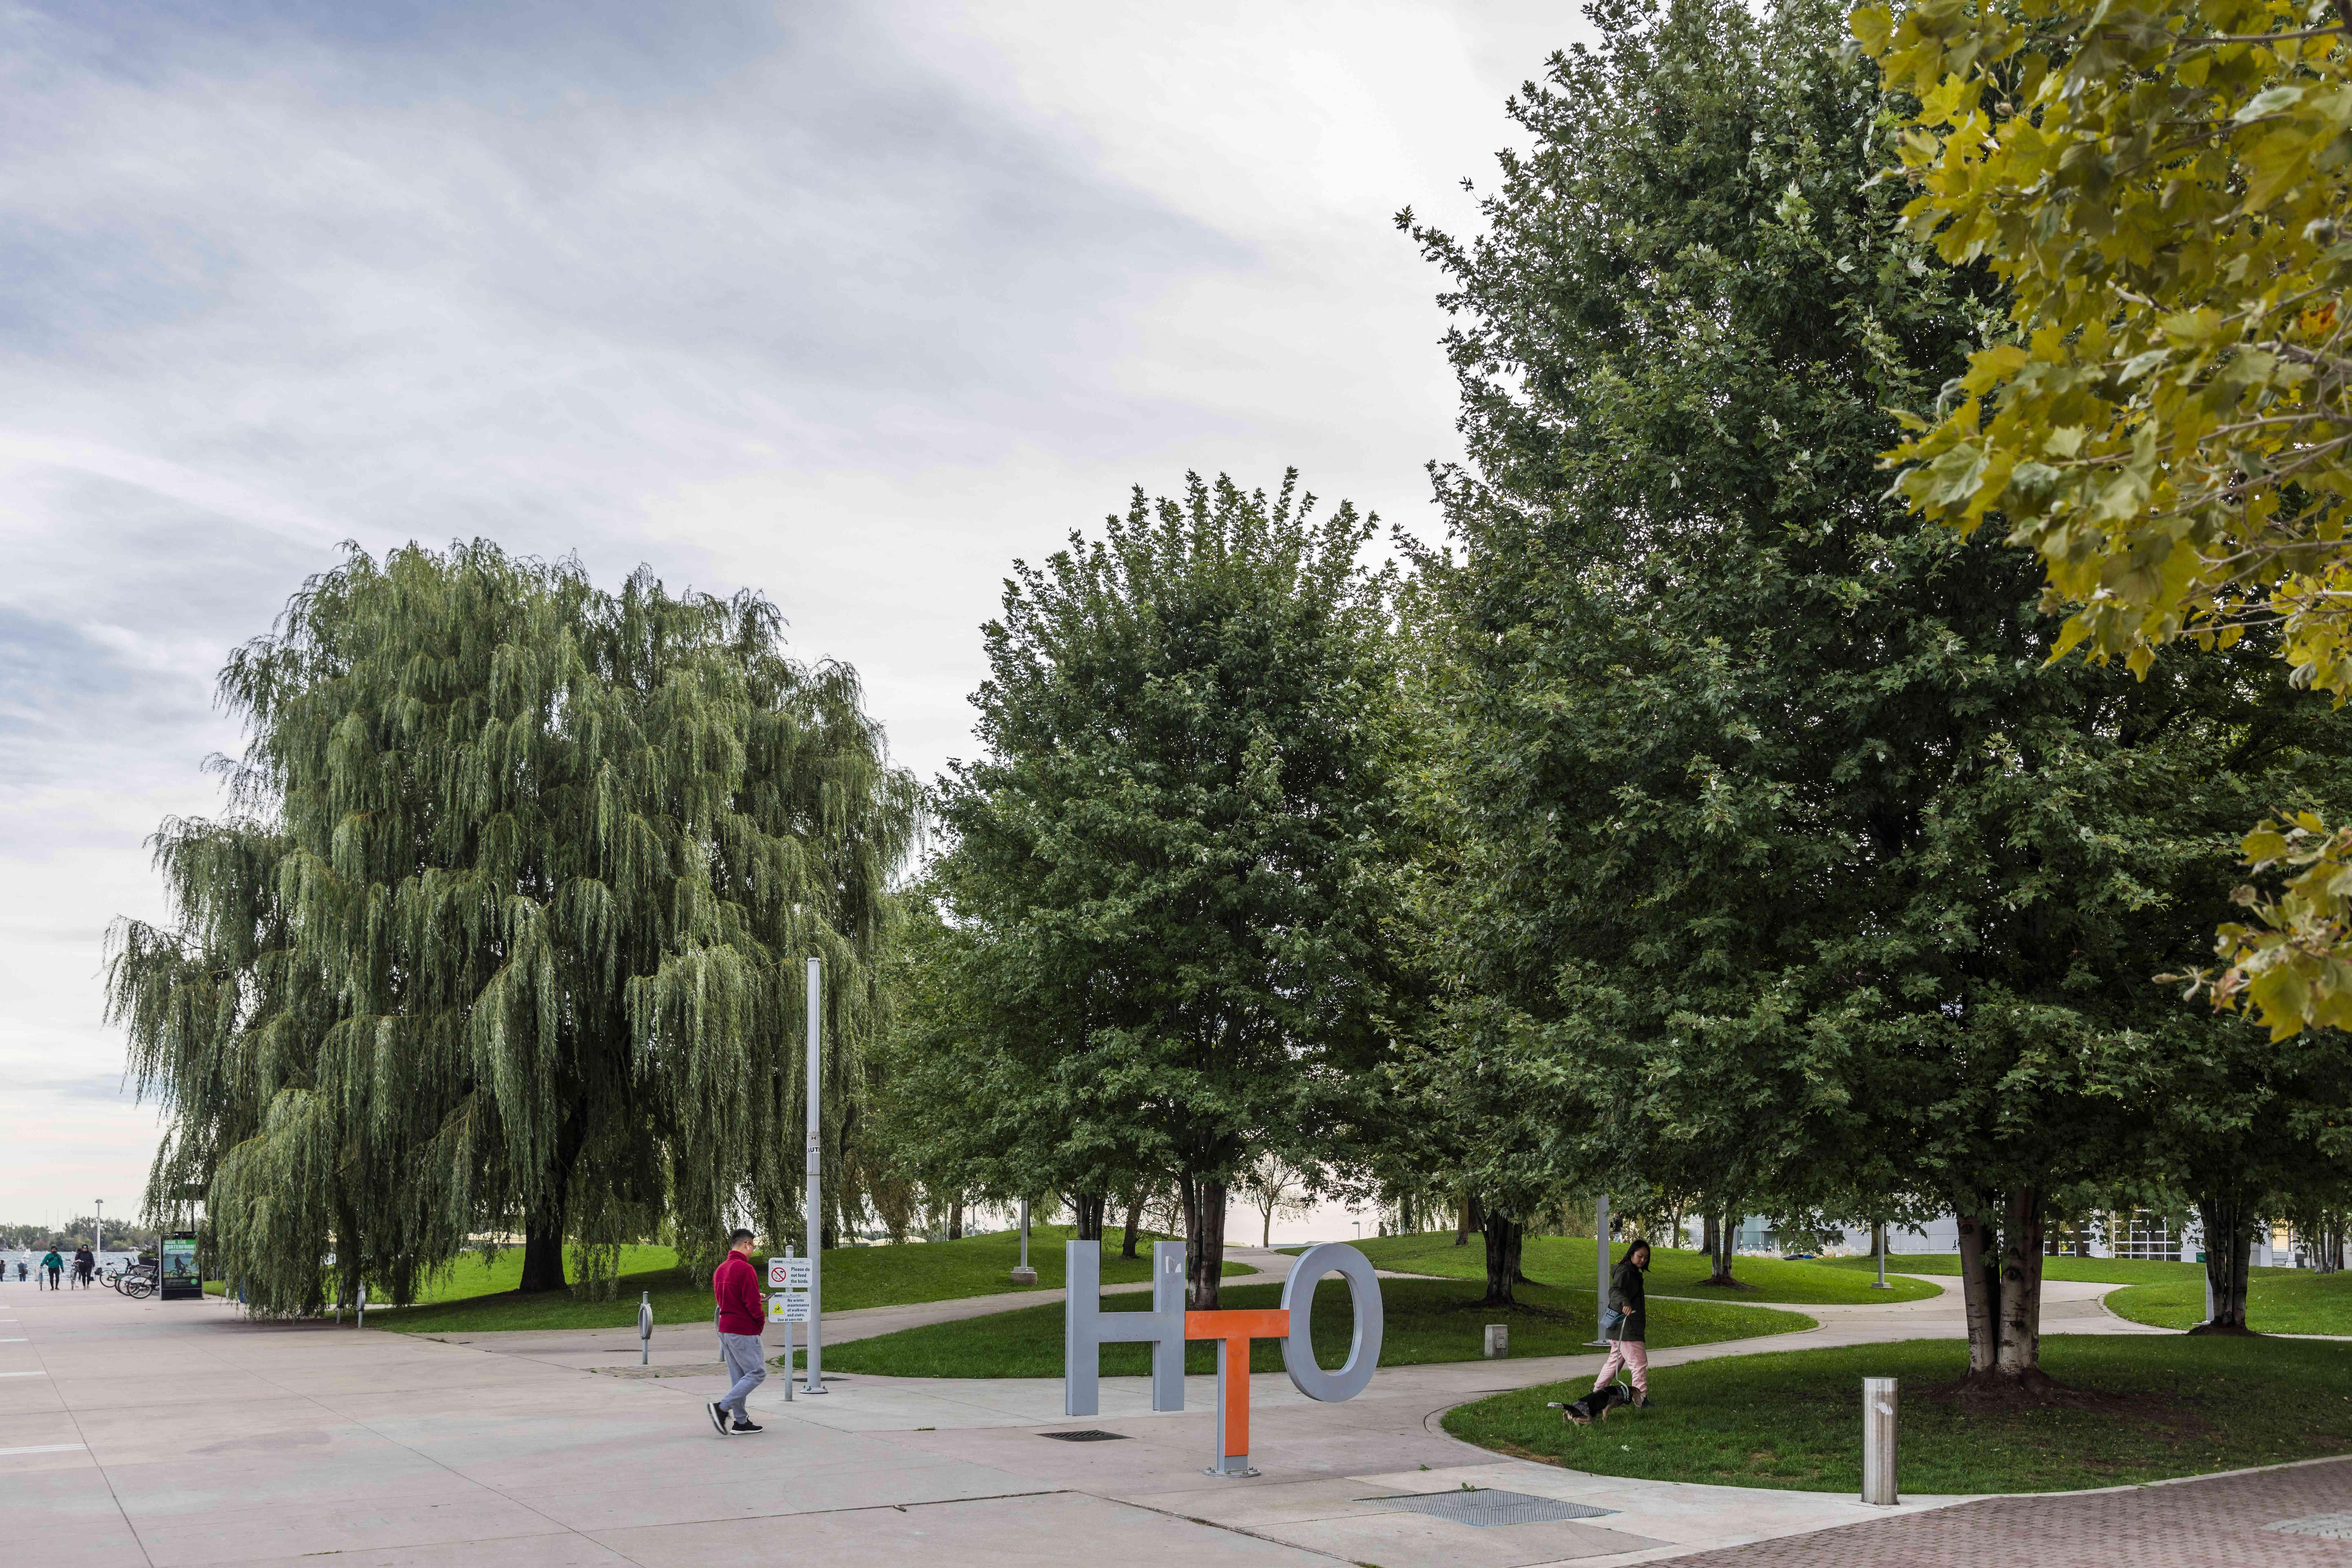 HTO Park in Toronto